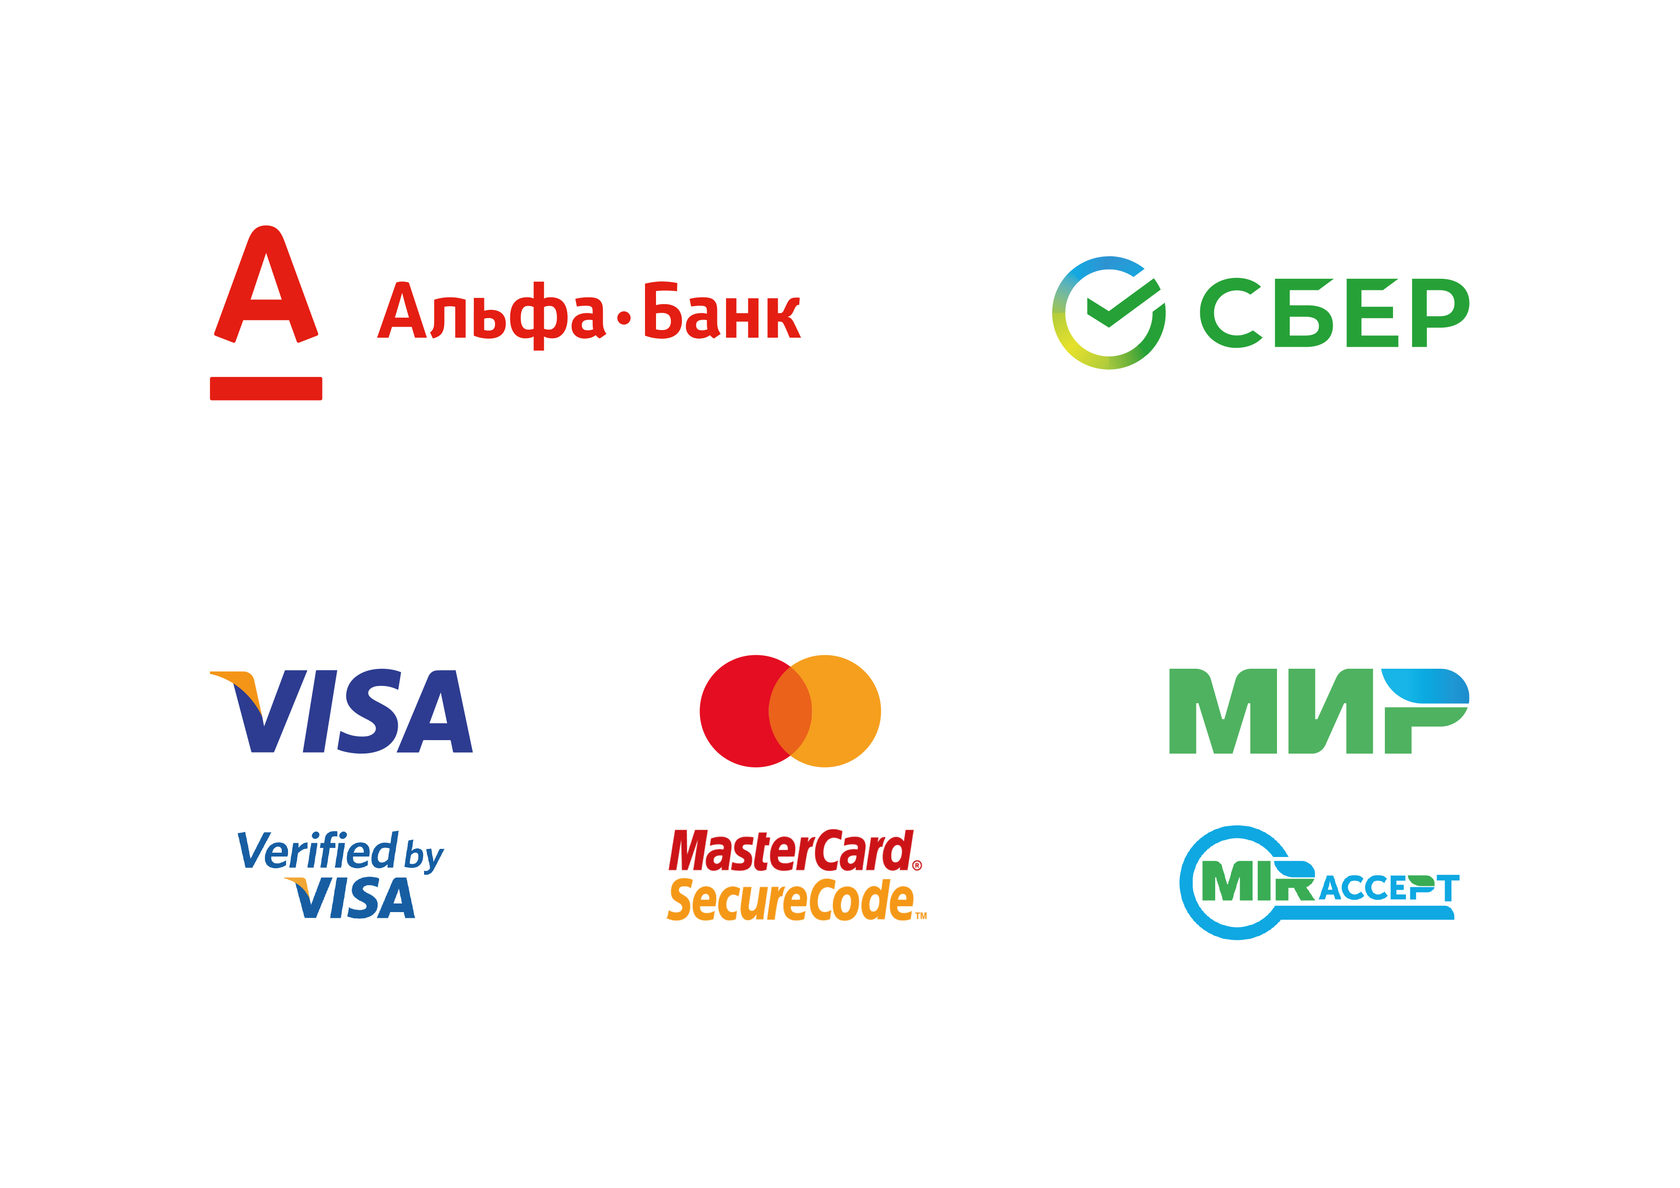 Оплата в момент доставки либо онлайн-платежом